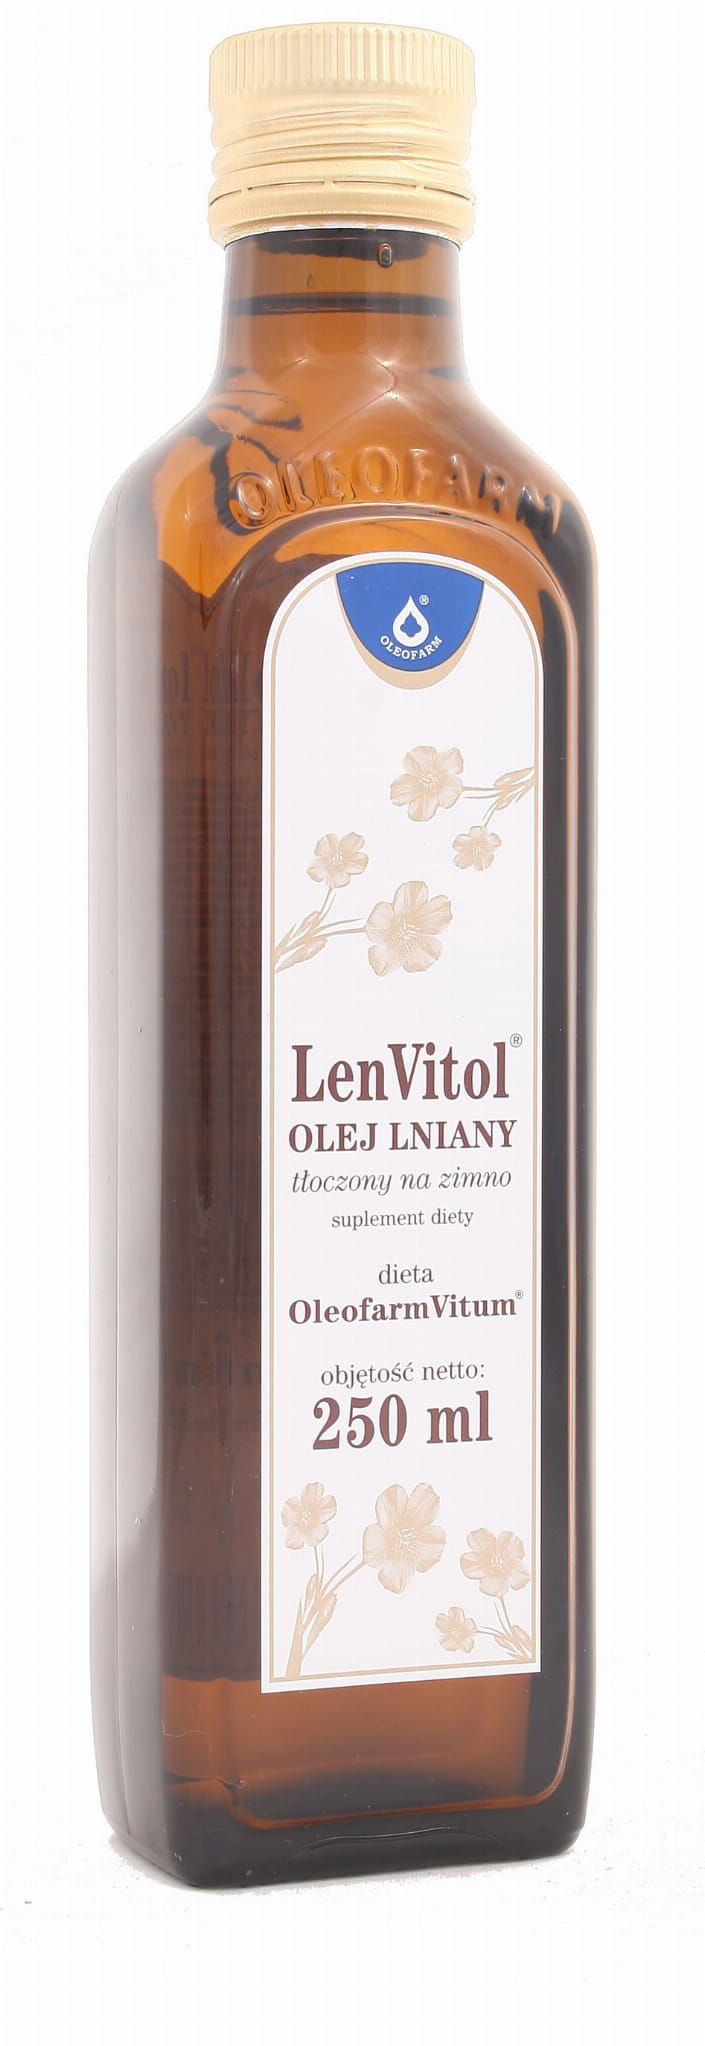 Olej Lniany Len Vitol tłoczony na zimno - Oleofarm - 250ml